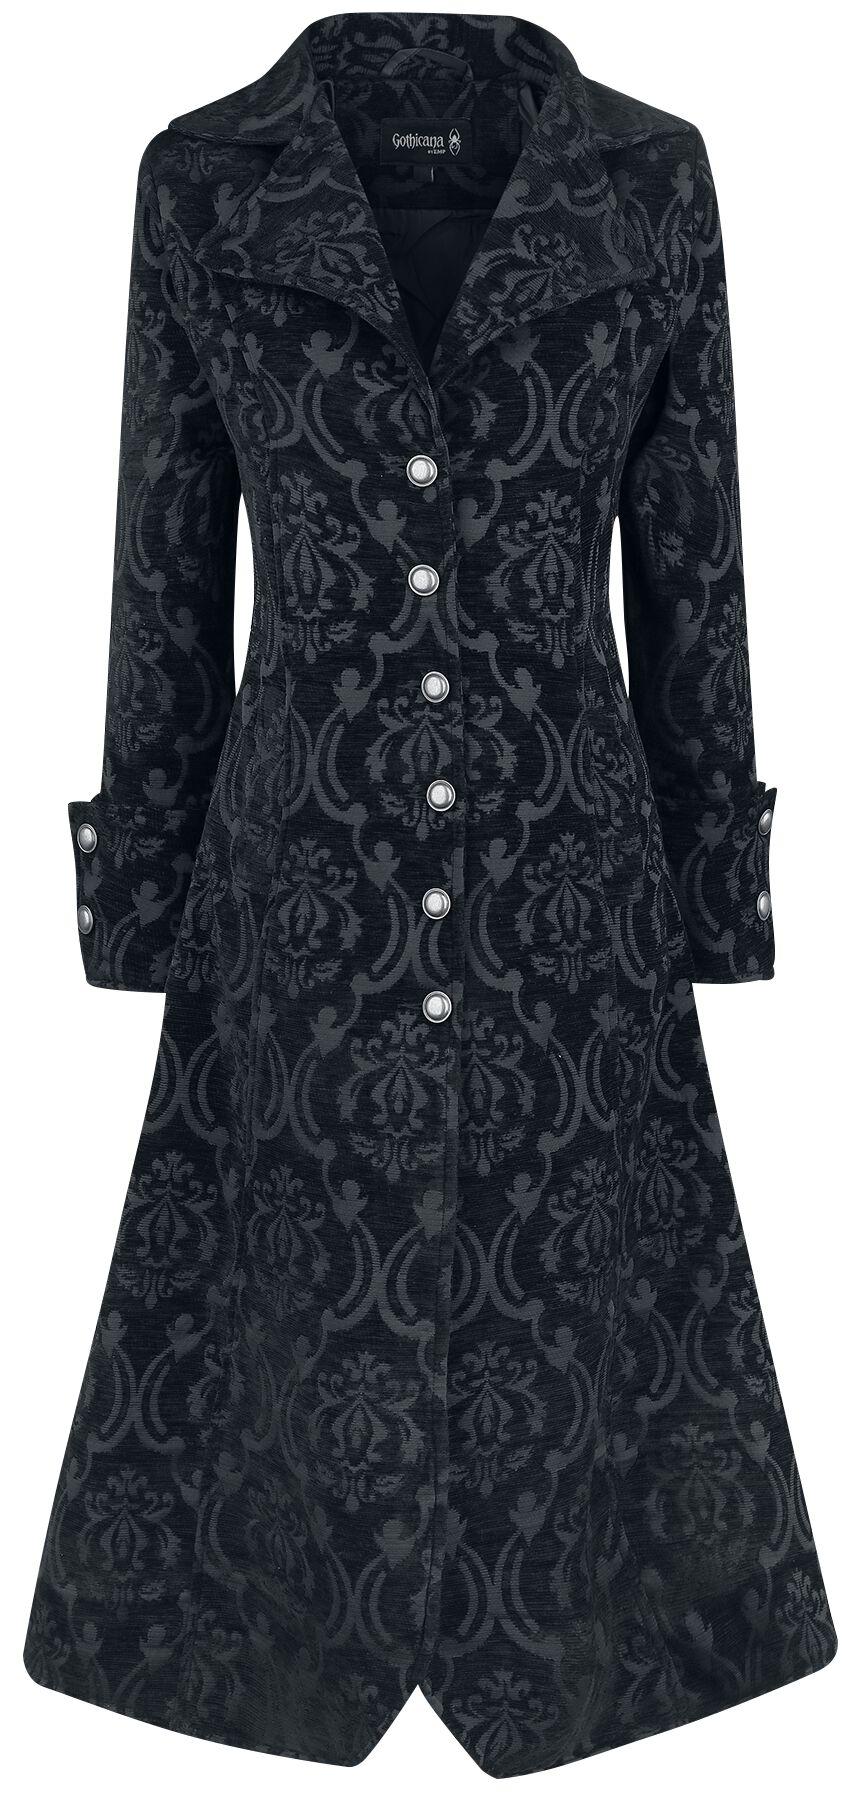 Image of   Gothicana by EMP Cythera Girlie frakke sort